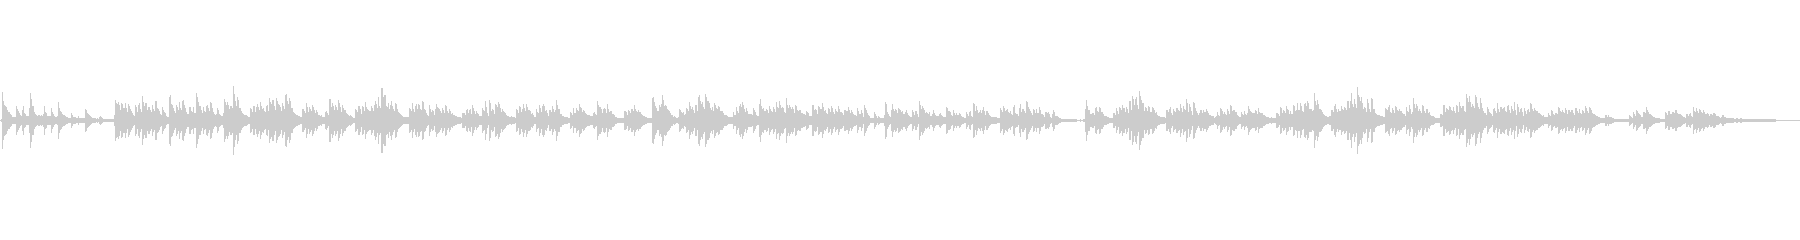 VLOG/BGM明るくあたたかな生ピアノの未再生の波形